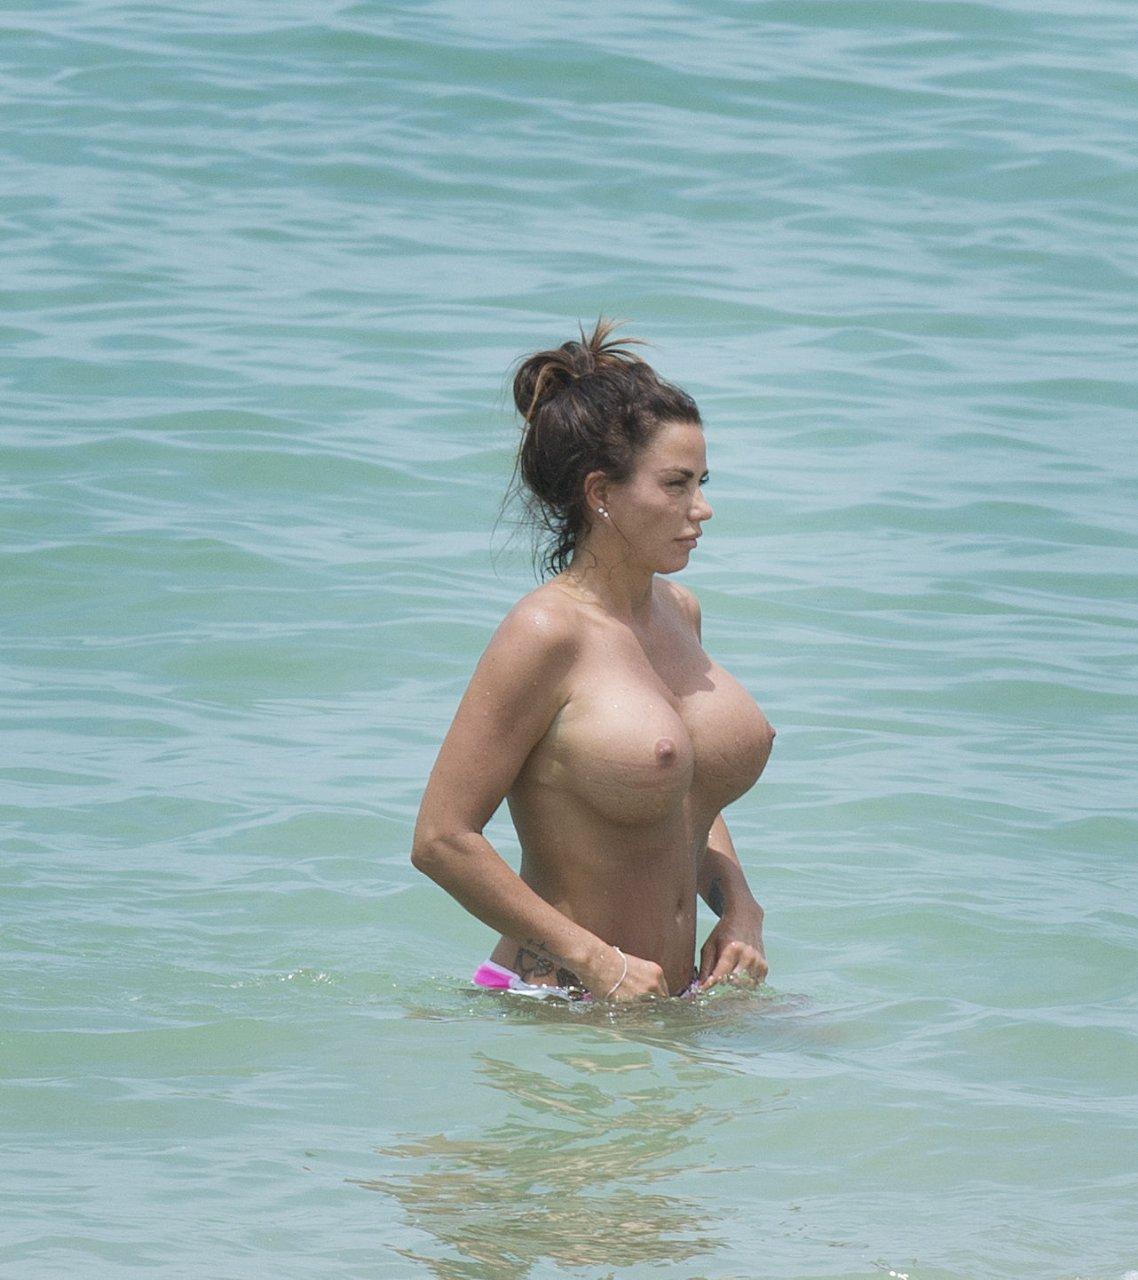 Katie-Price-Topless-TheFappeningBlog.com-15.jpg